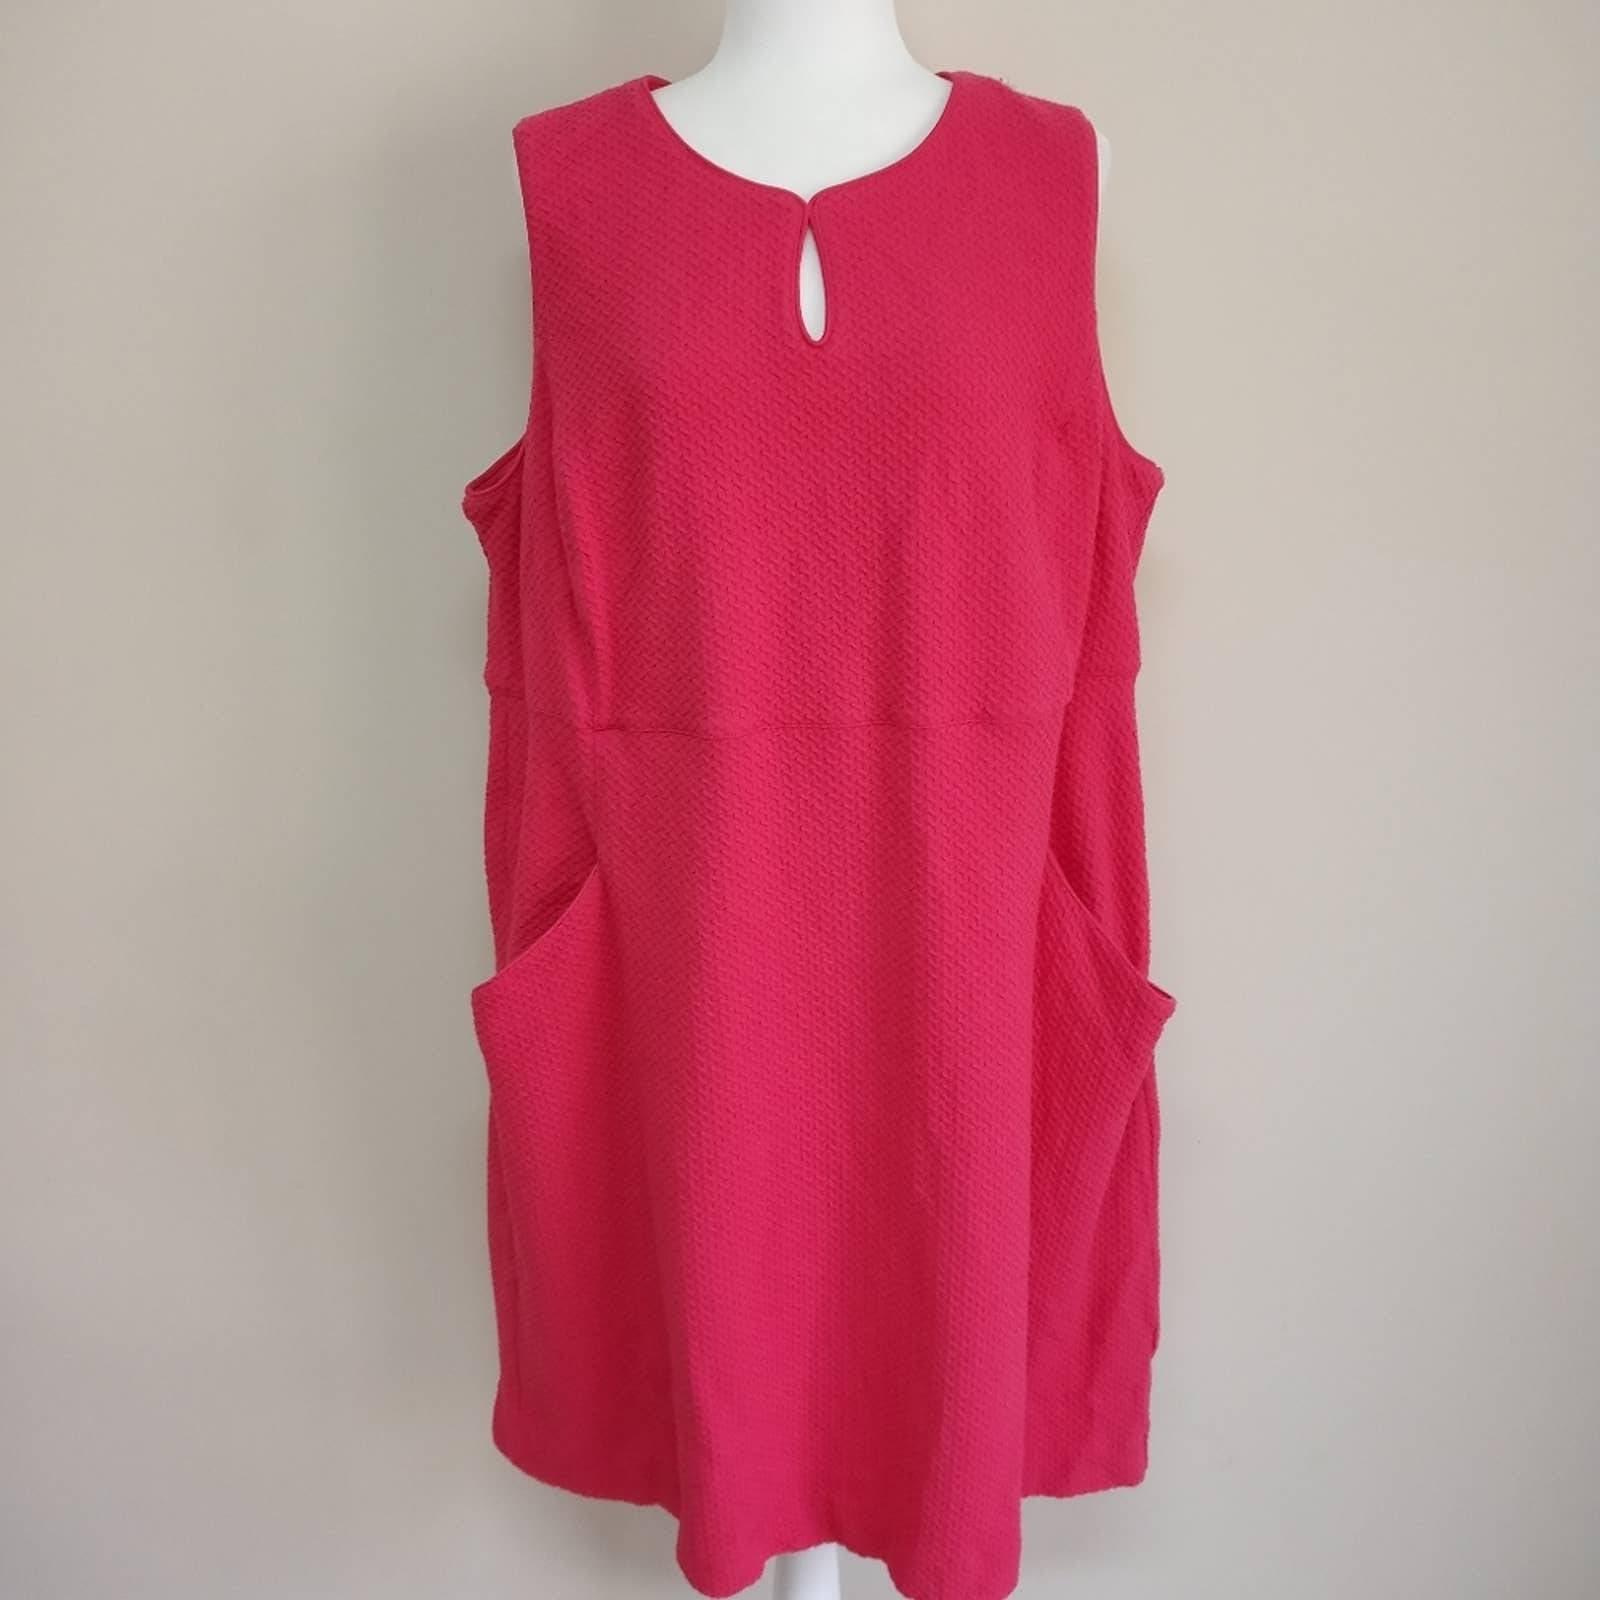 Land's End Pink Sheath Dress Stretchy